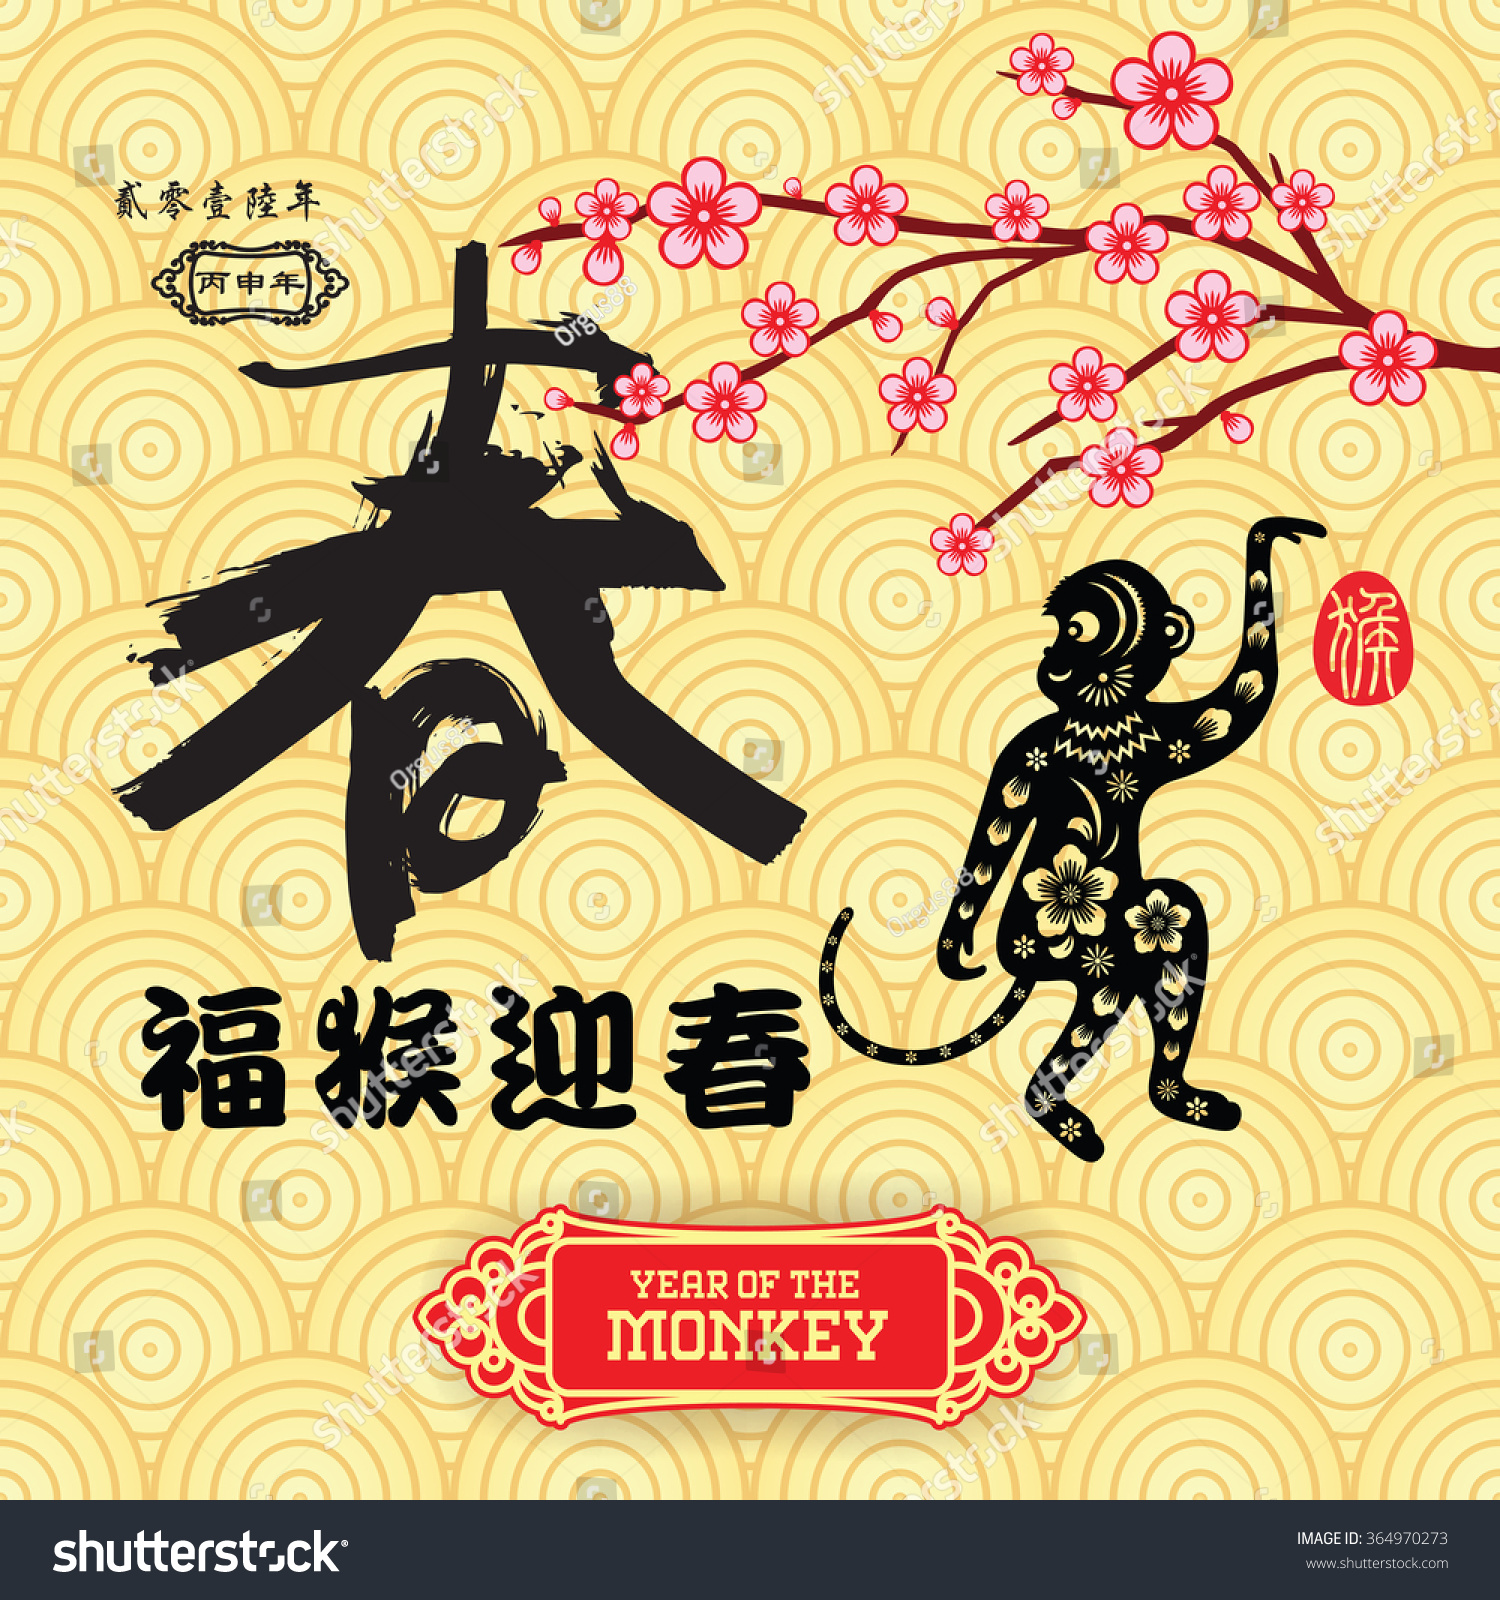 2016 lunar new year greeting card monkey paper cut design id 364970273 m4hsunfo